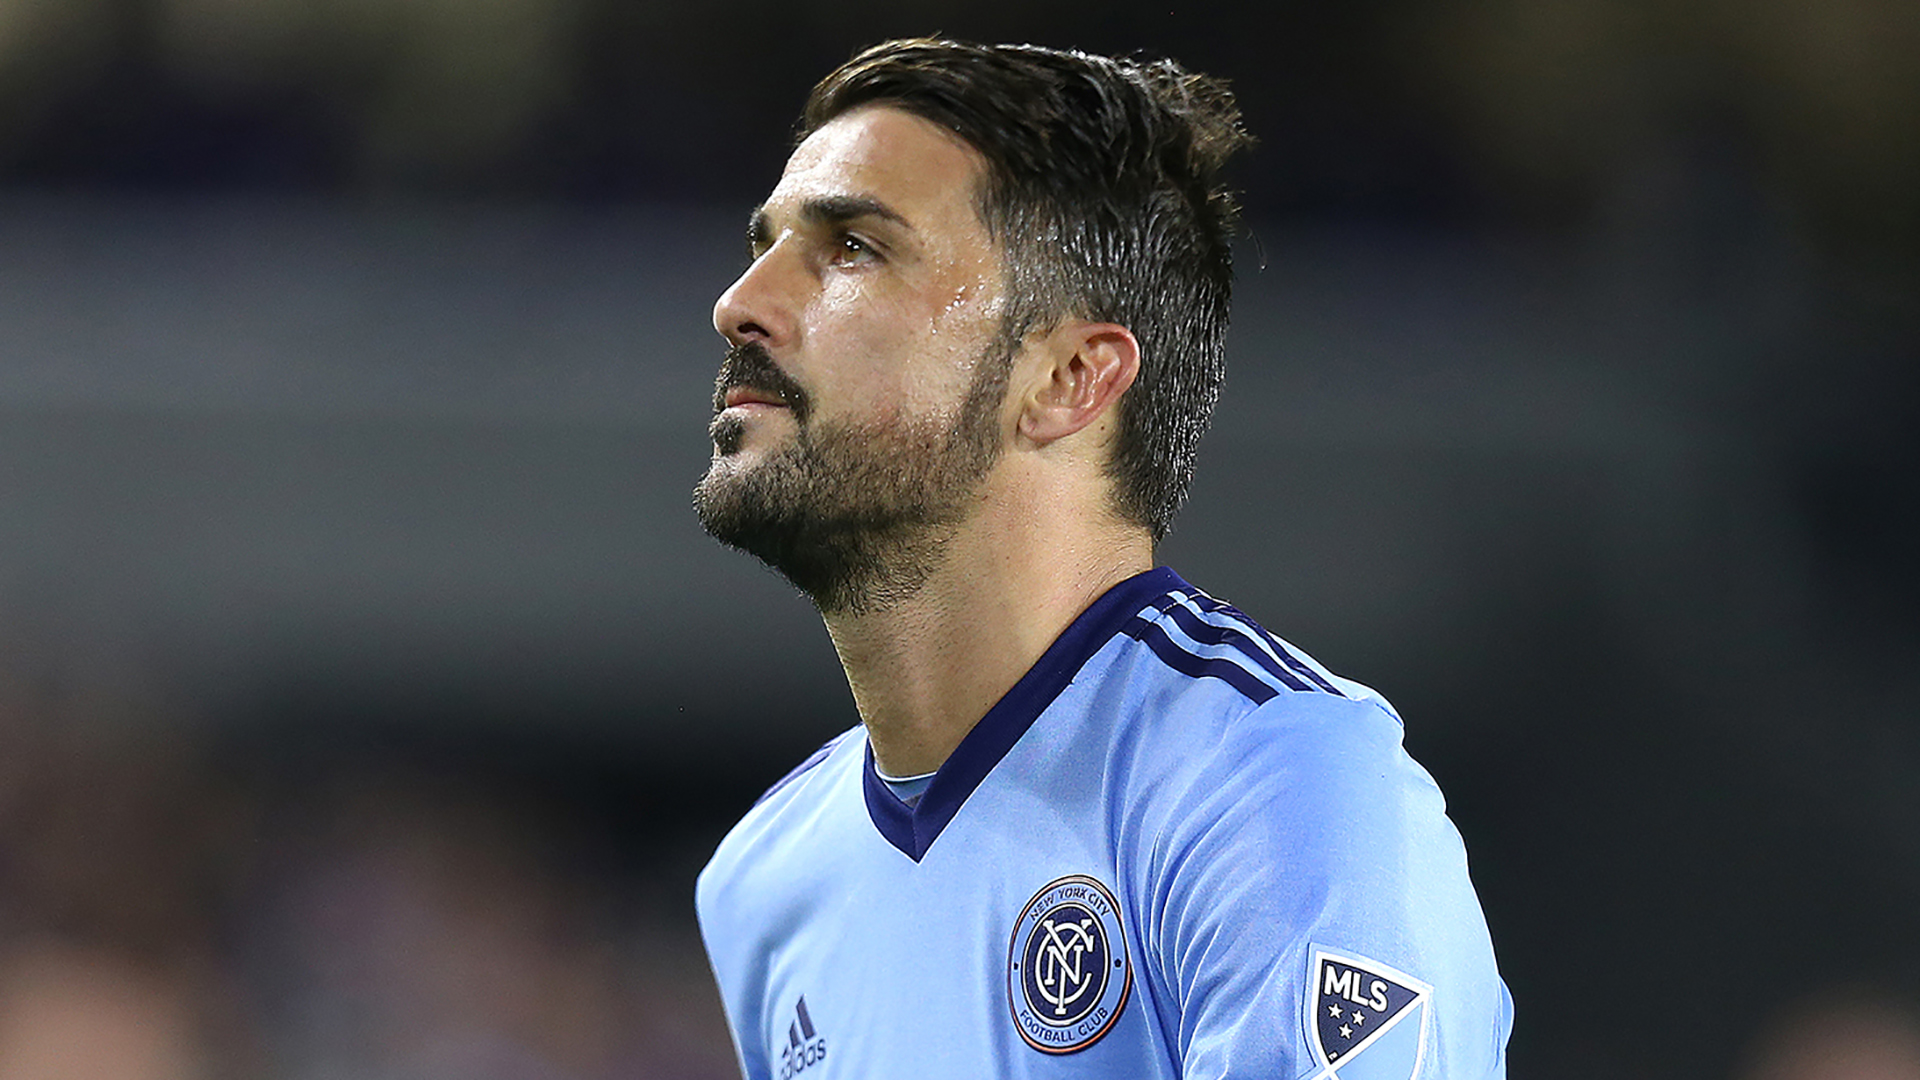 NYCFC investigating sexual harassment allegations involving David Villa